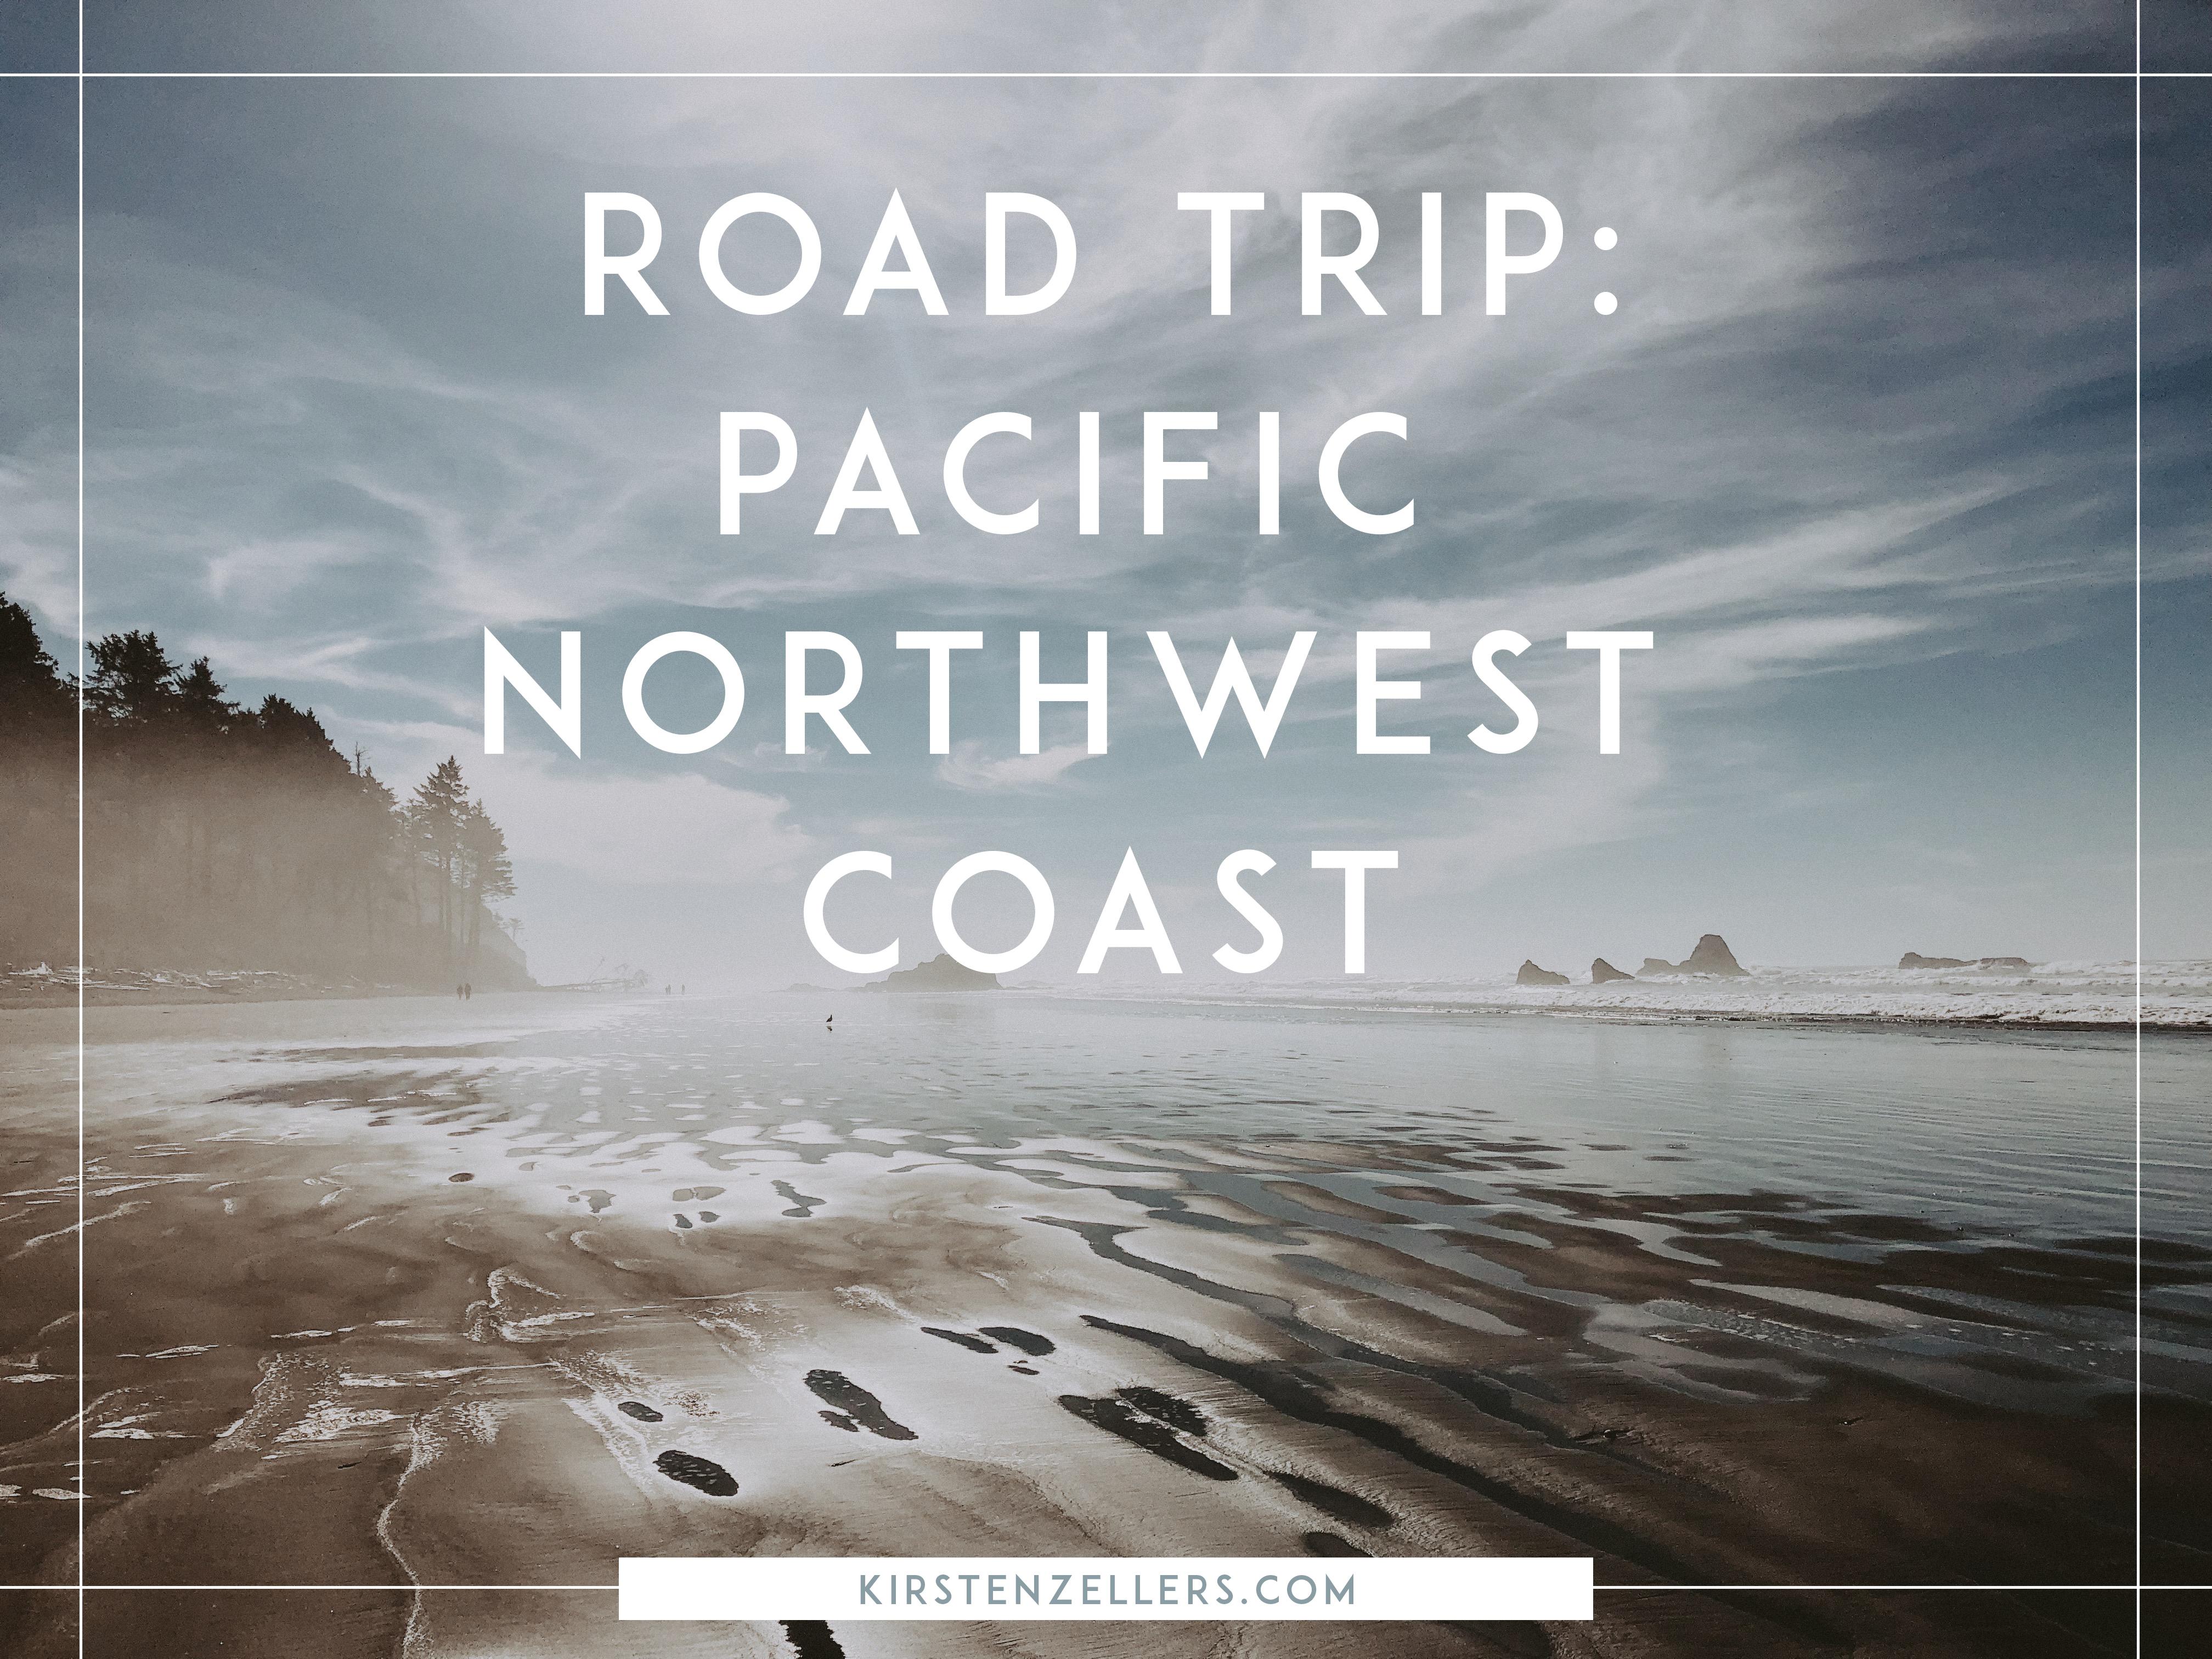 Pacific Northwest Coast Road Trip Guide / Kirsten Zellers